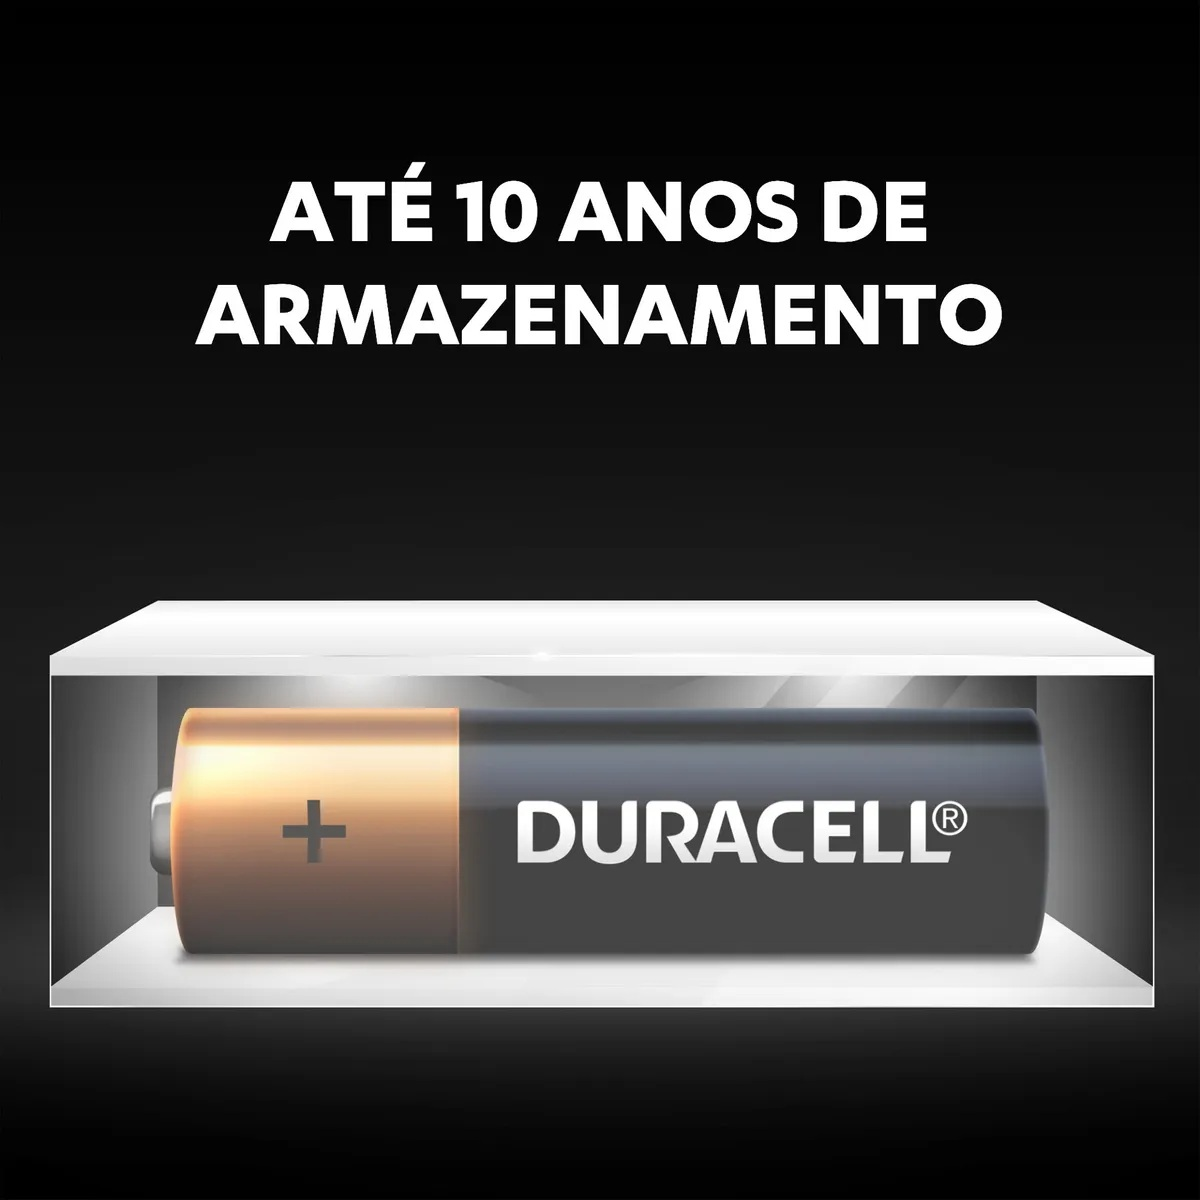 Kit 48 Pilha AAA Duracell Palito 3 Cartelas C/16 Original Revenda